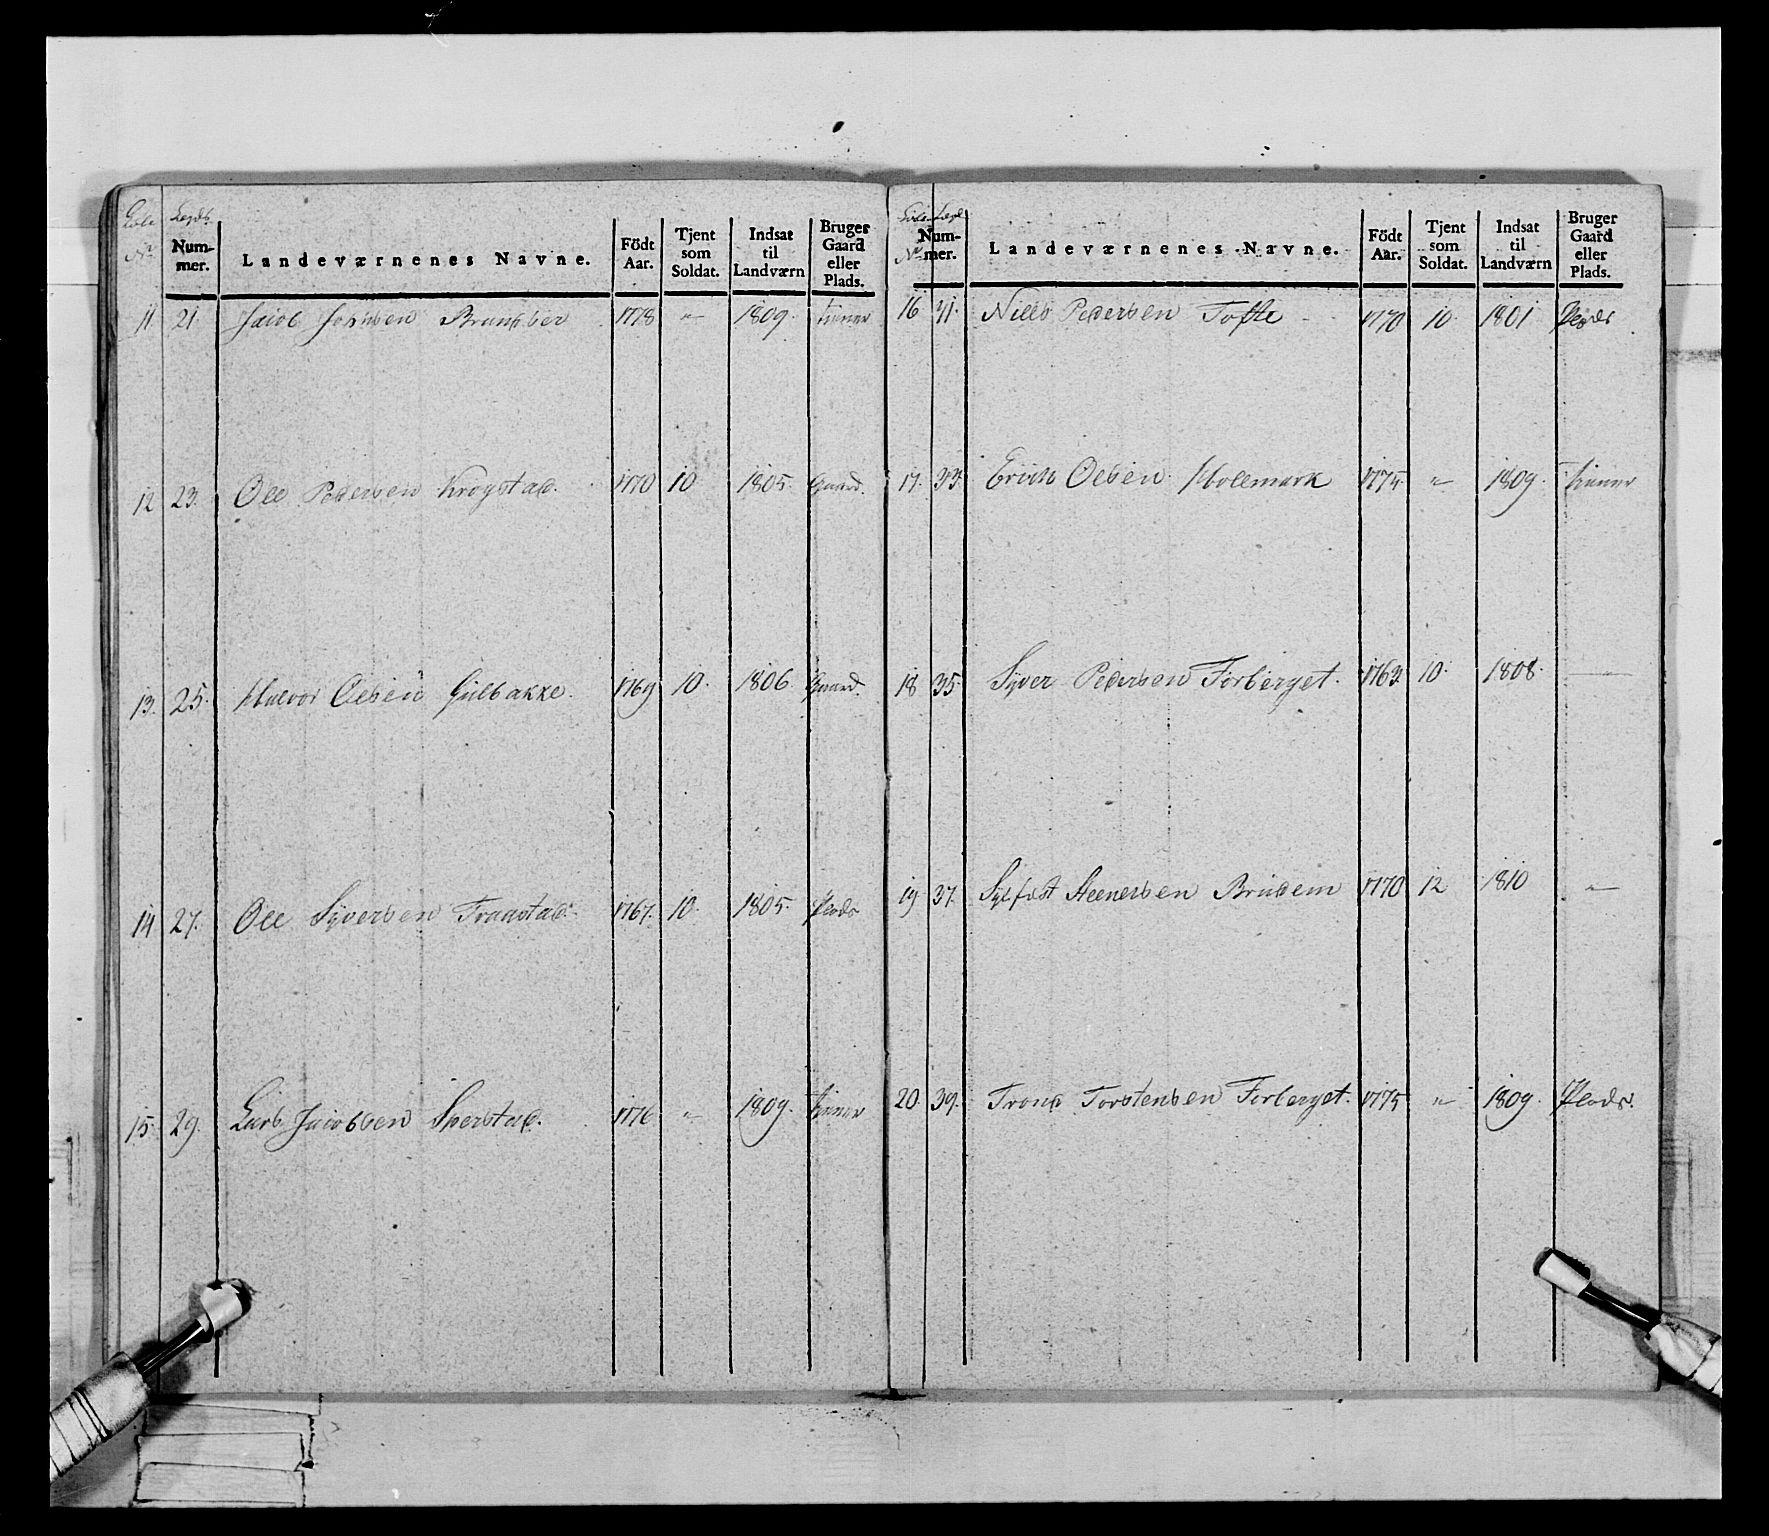 RA, Generalitets- og kommissariatskollegiet, Det kongelige norske kommissariatskollegium, E/Eh/L0069: Opplandske gevorbne infanteriregiment, 1810-1818, p. 647